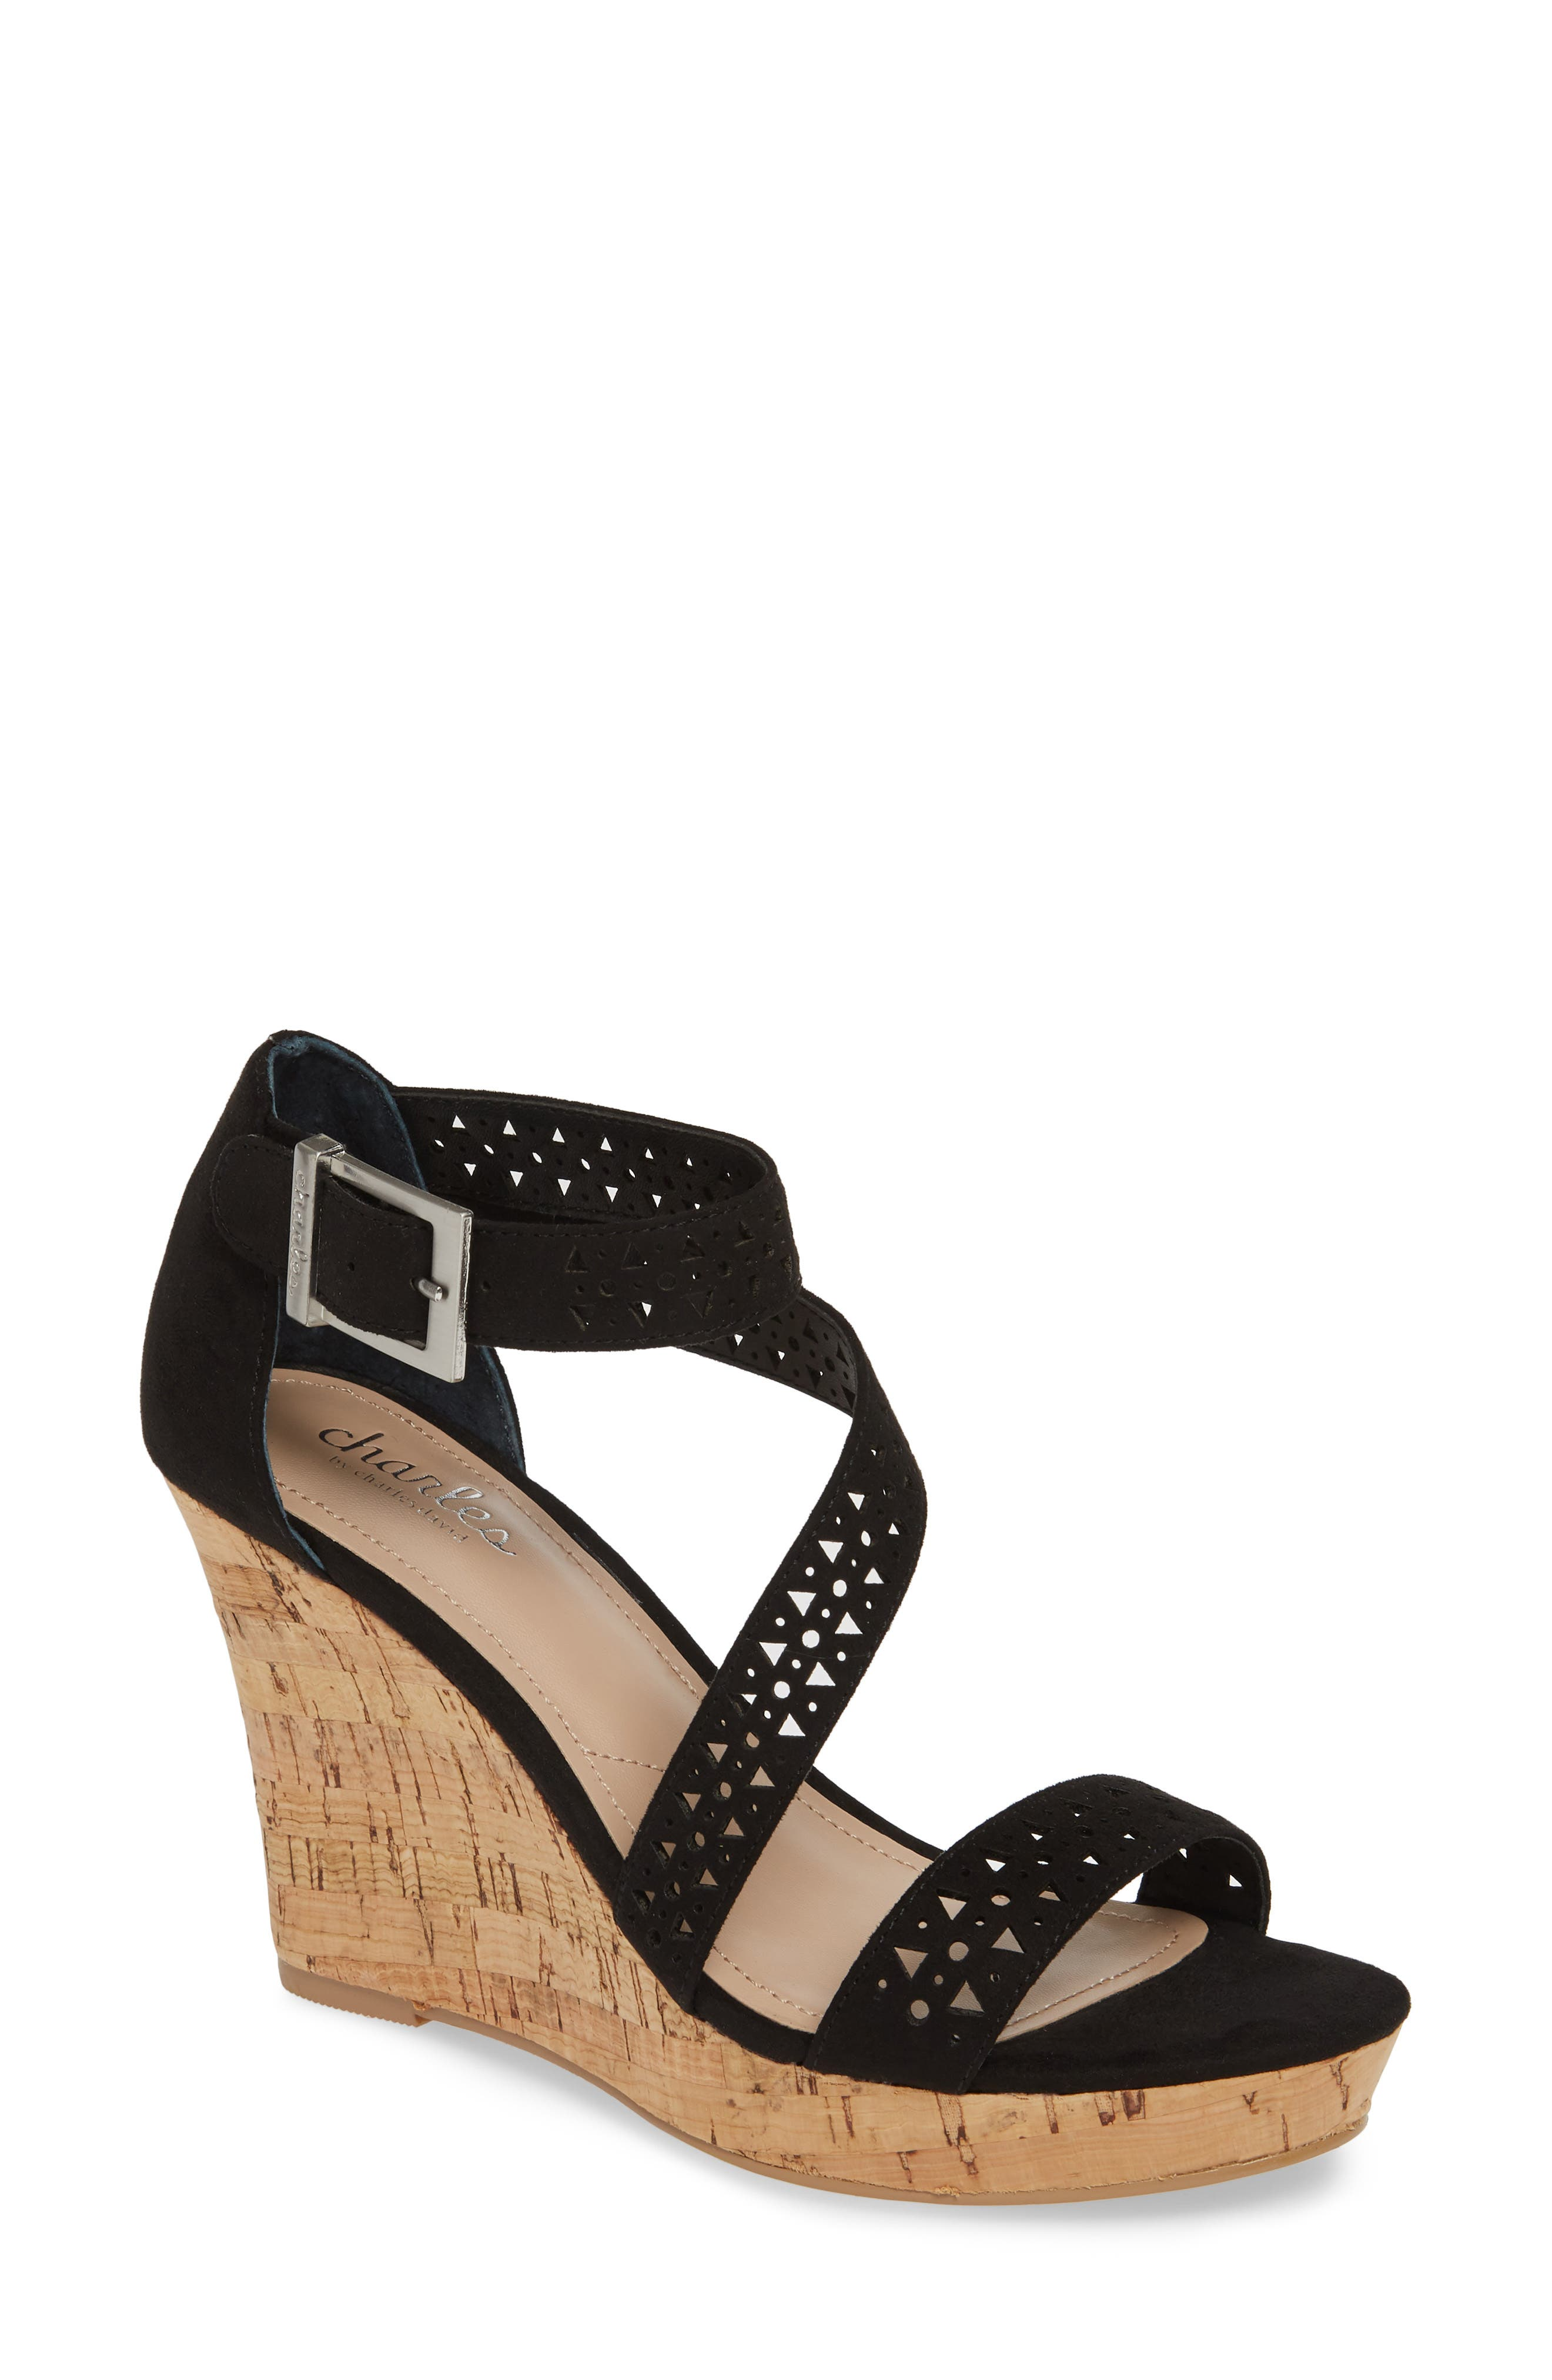 CHARLES BY CHARLES DAVID Landon Perforated Wedge Sandal, Main, color, BLACK FABRIC